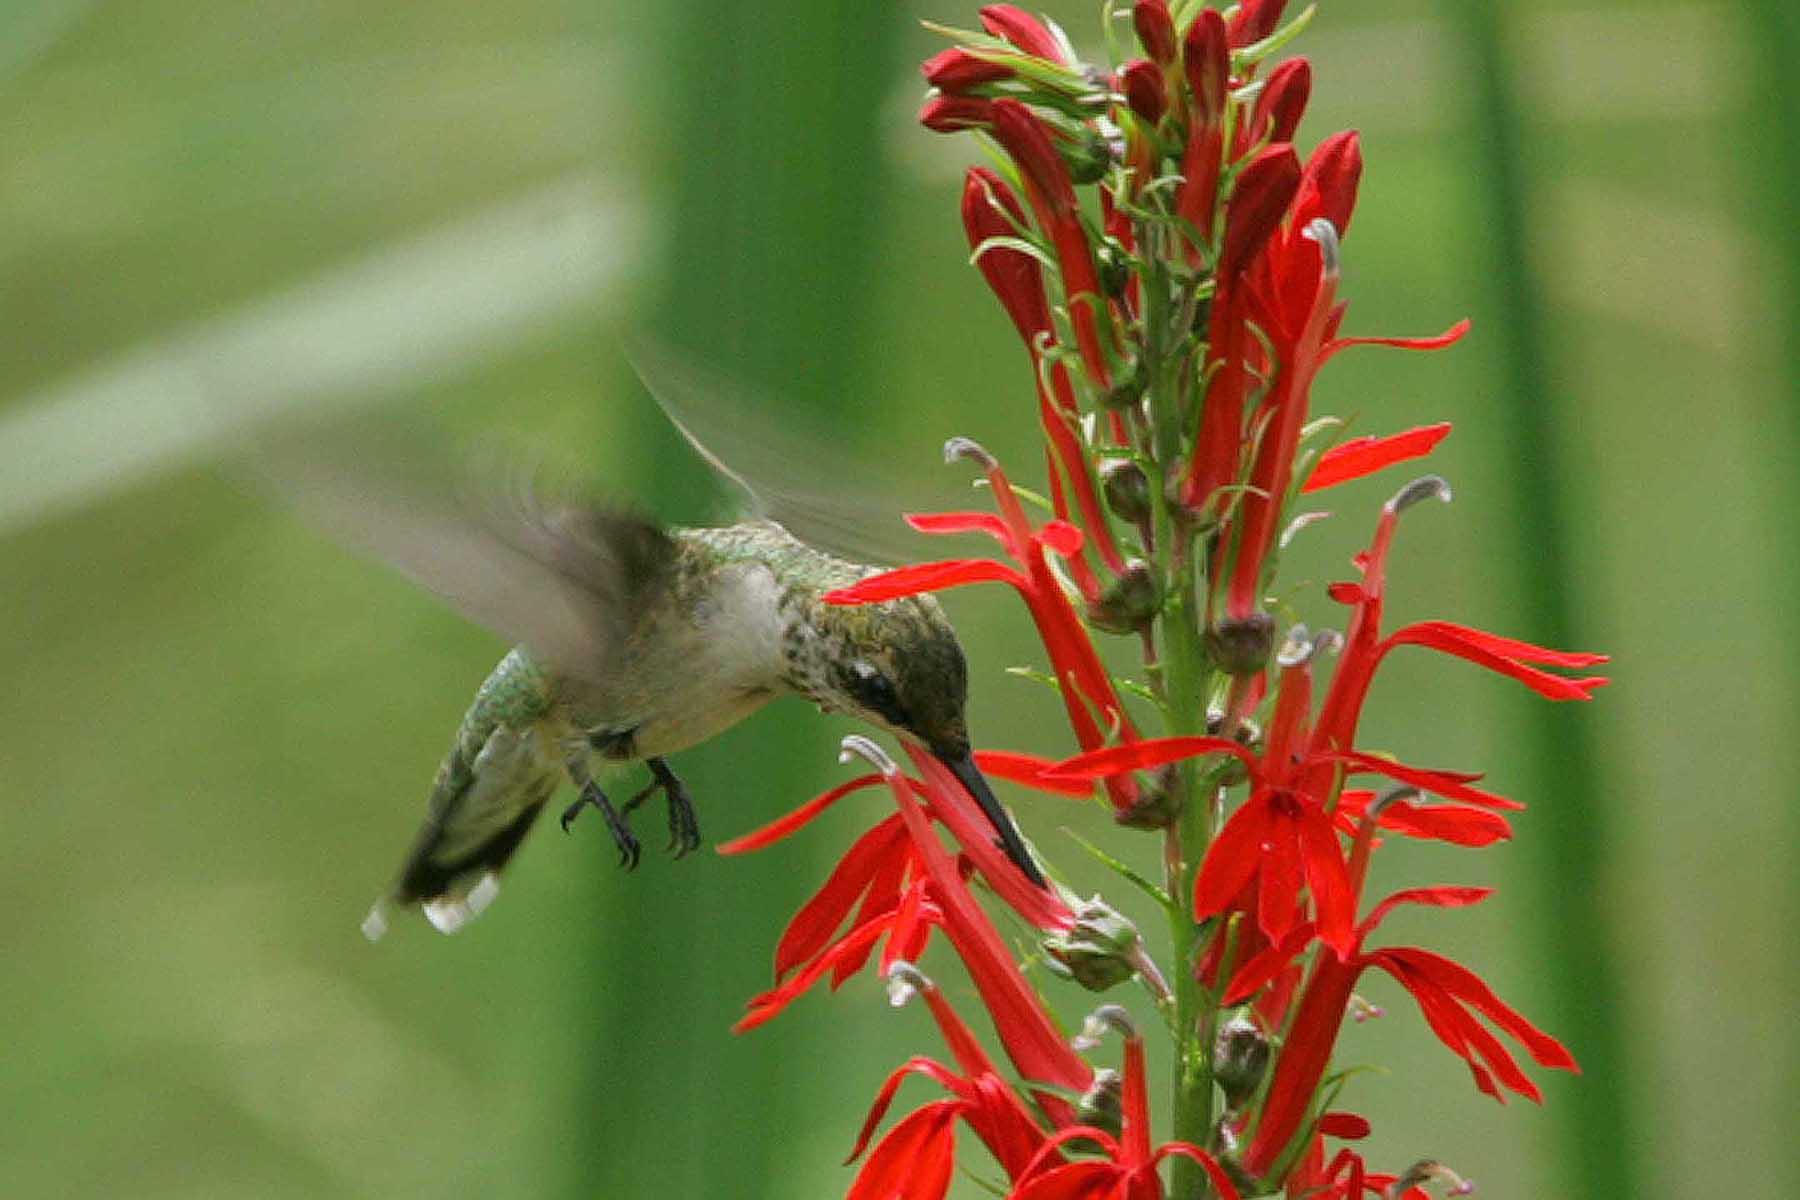 A ruby-throated hummingbird visits a native cardinal flower. Photo courtesy USFWS